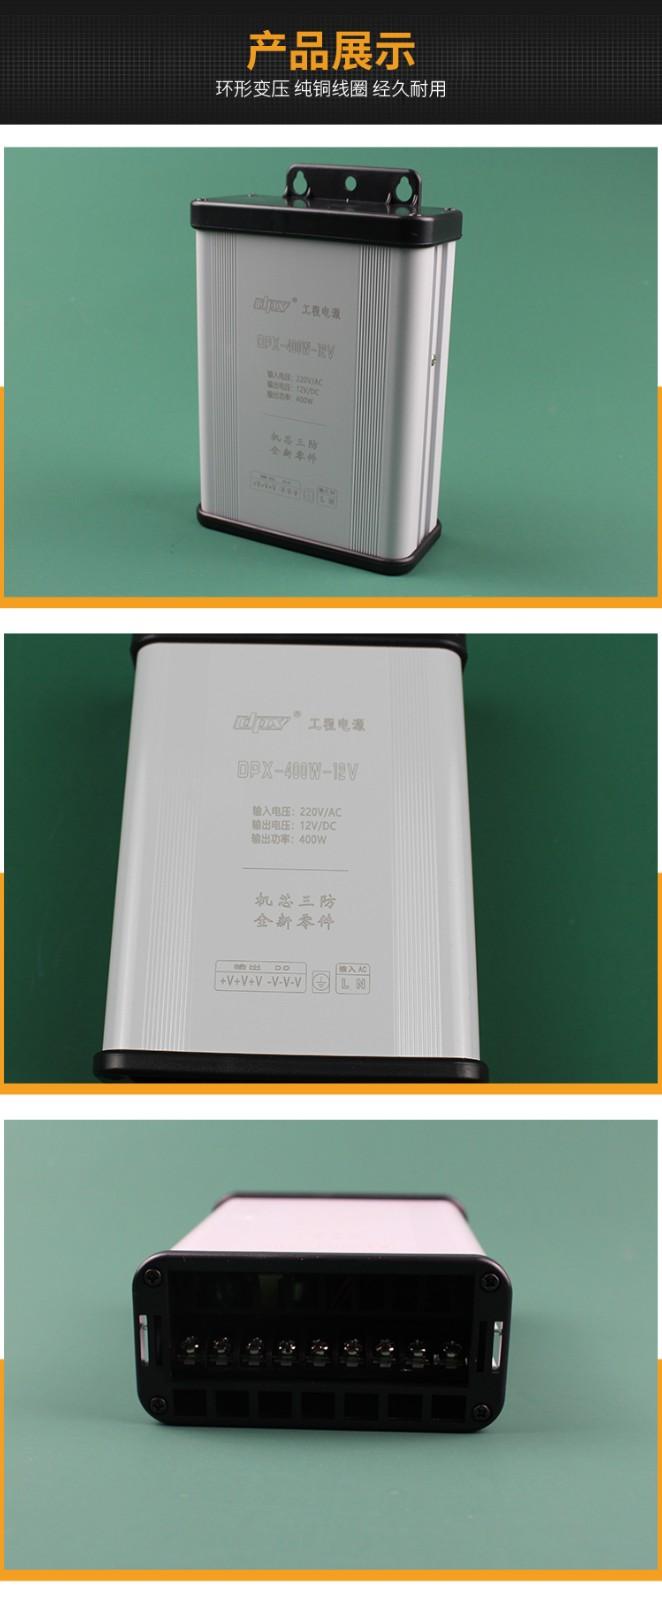 ,LED工程电源,防雨防水,DPX-400W-12V示例图5